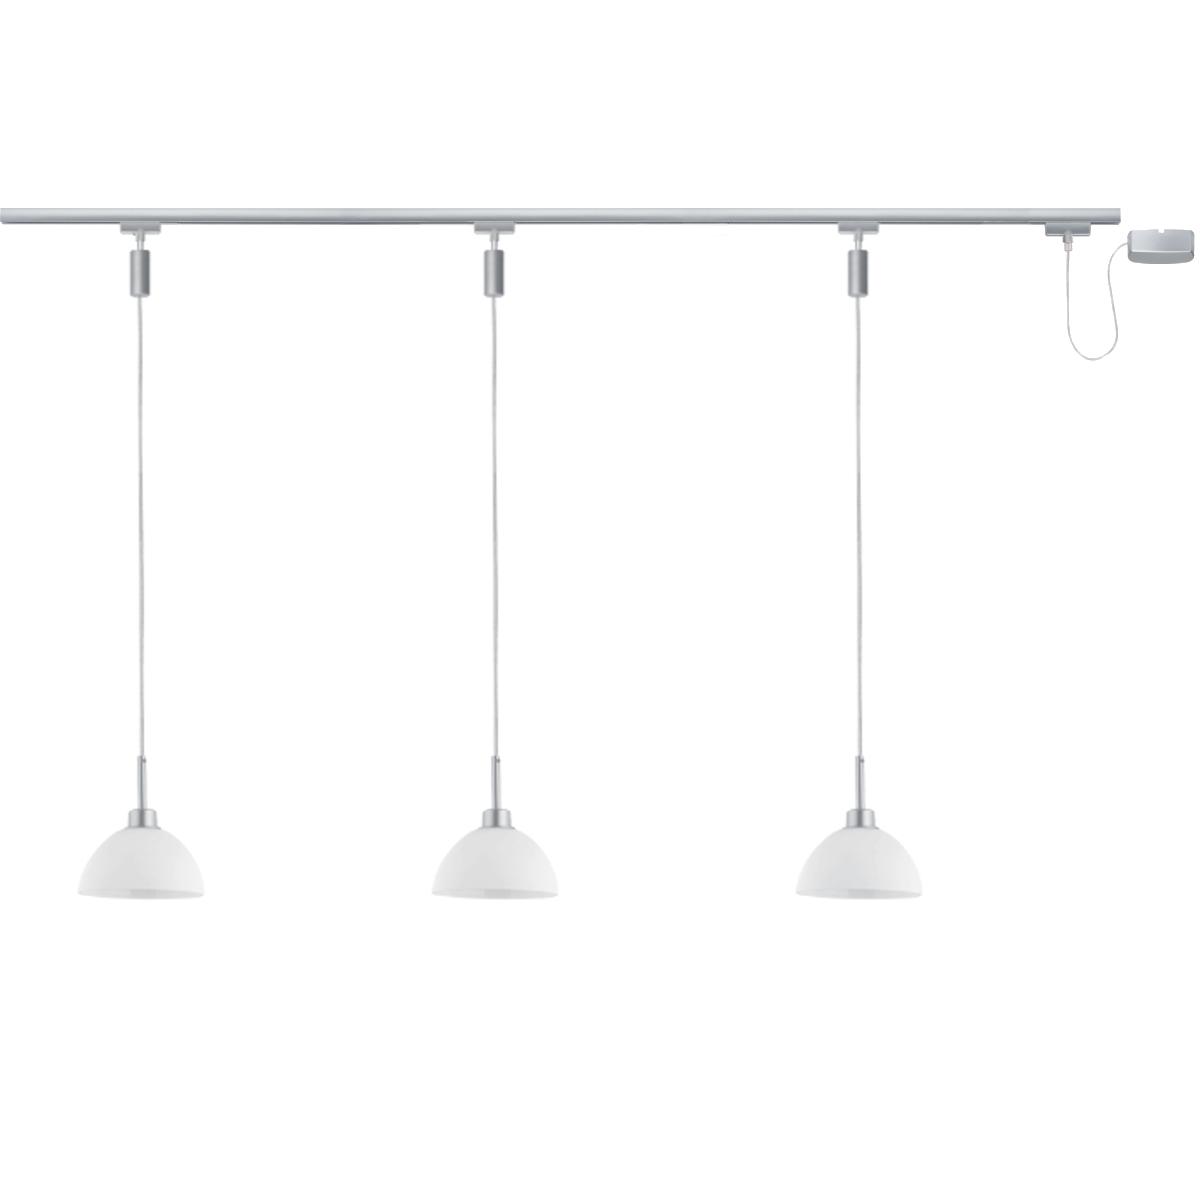 paulmann urail beleuchtung schienensystem planungshilfe. Black Bedroom Furniture Sets. Home Design Ideas